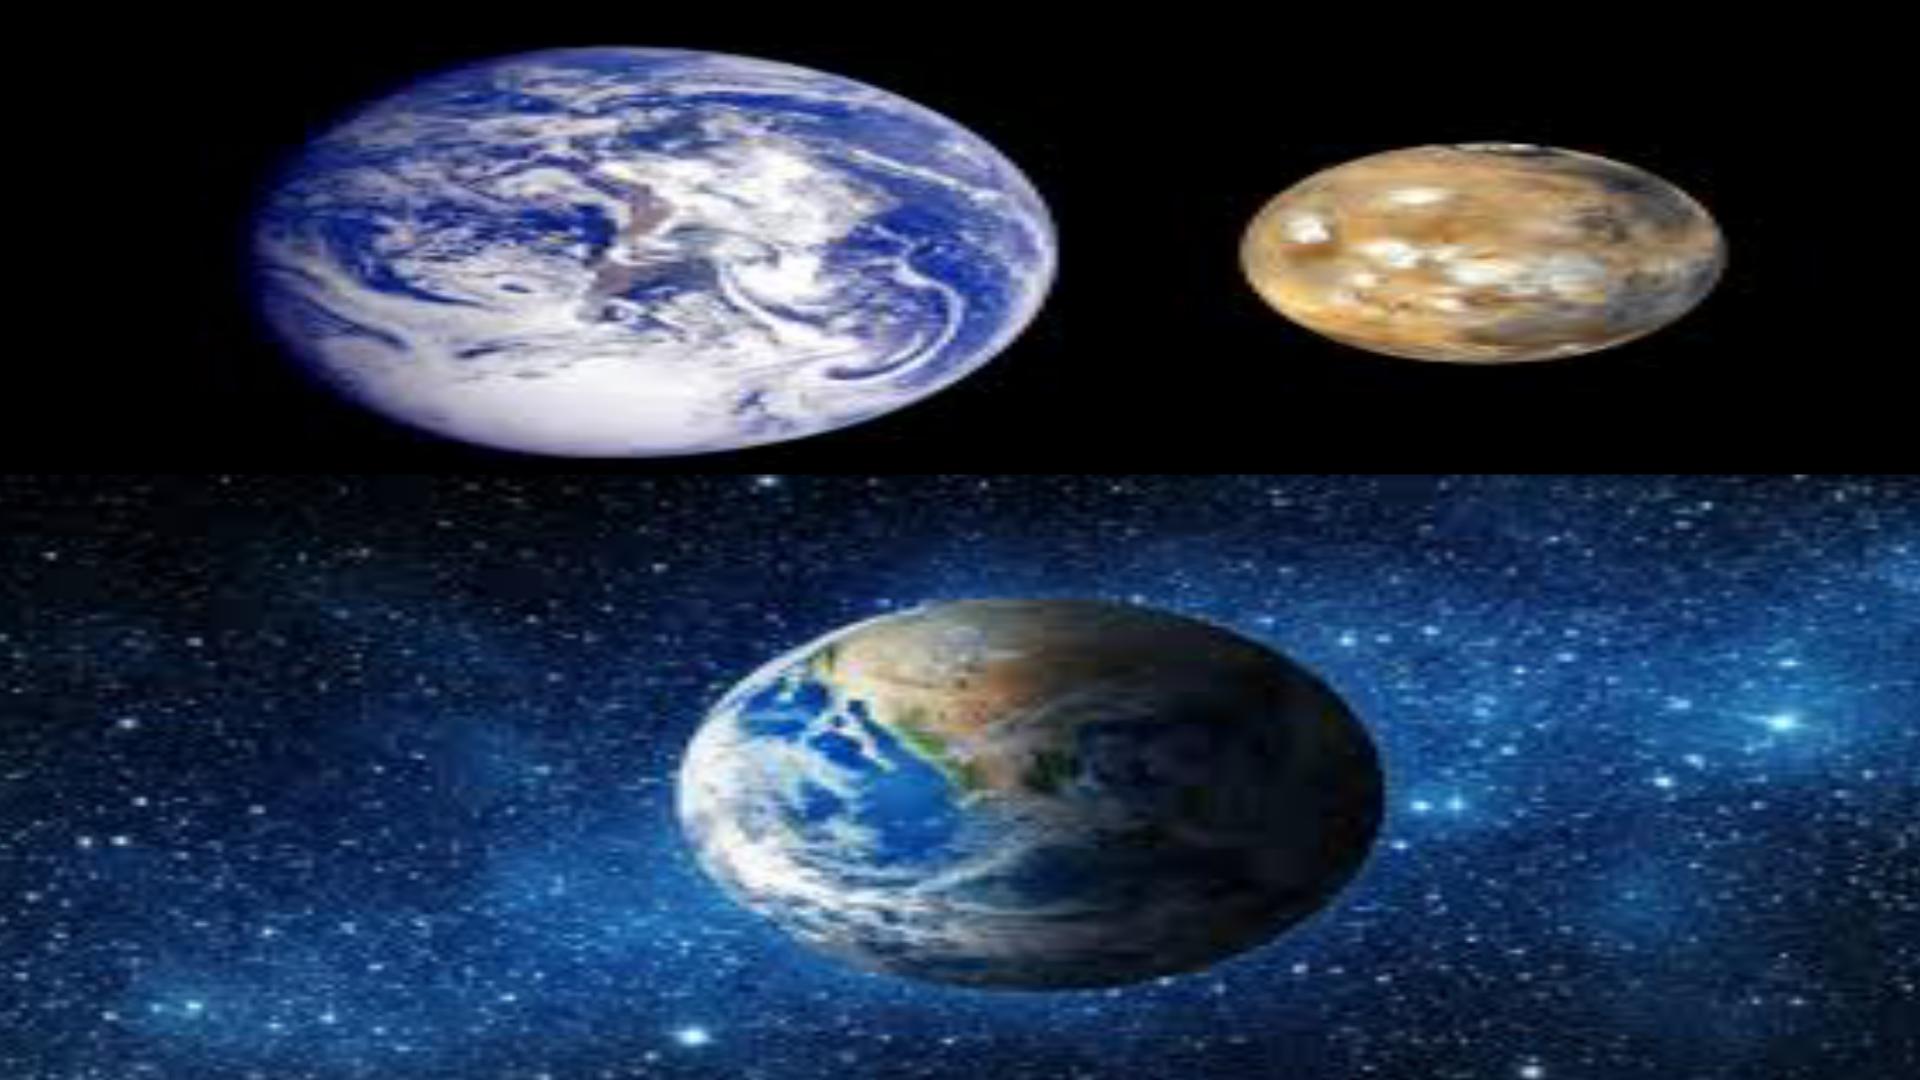 Biggest Scientific discoveries of 2020 - 2020 की सबसे बड़ी वैज्ञानिक खोजें